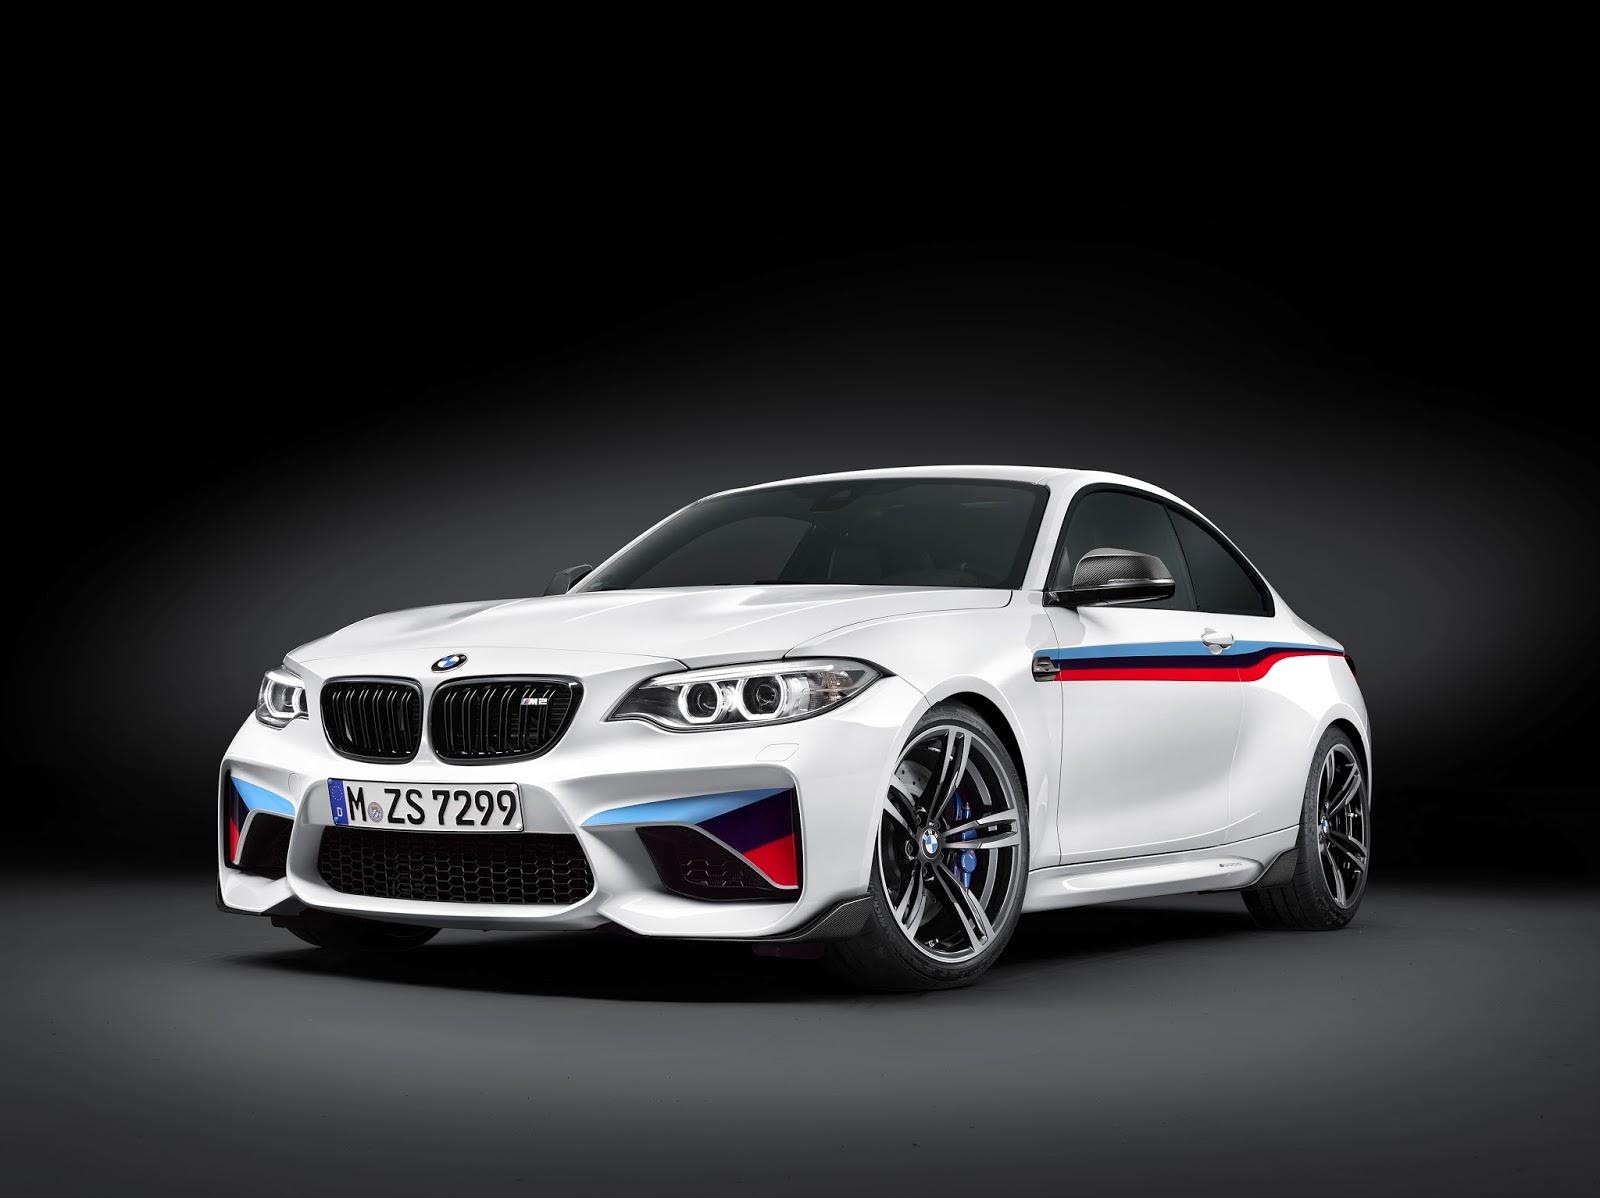 P90207893 highRes the new bmw m2 coupe Νέα Αξεσουάρ M Performance για τη νέα BMW M2 Coupé. BMW, BMW M2, BMW M2 Coupé, Αξεσουάρ